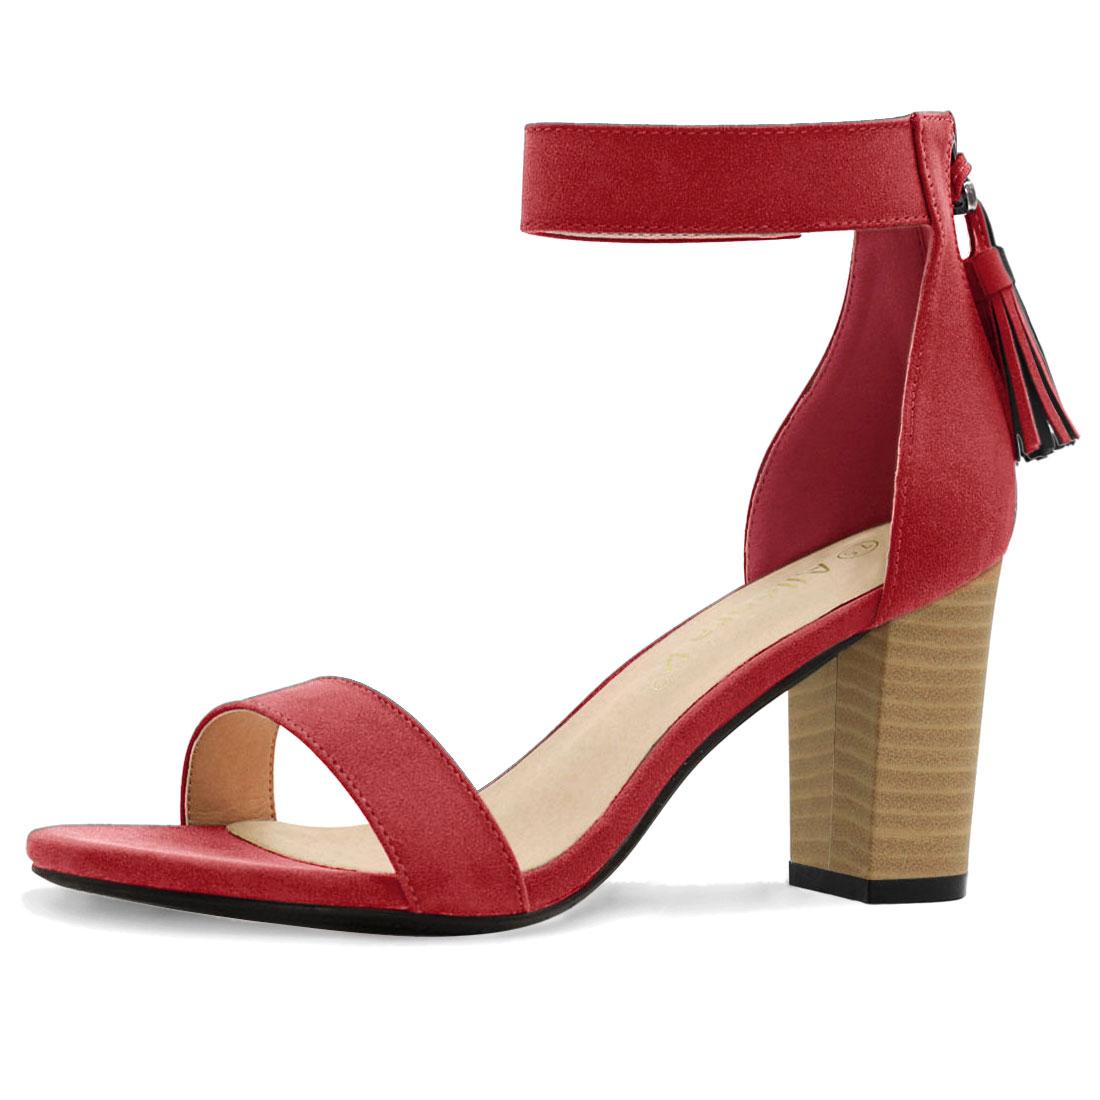 Women Open Toe Tassel Stacked Heel Ankle Strap Sandals Red US 7